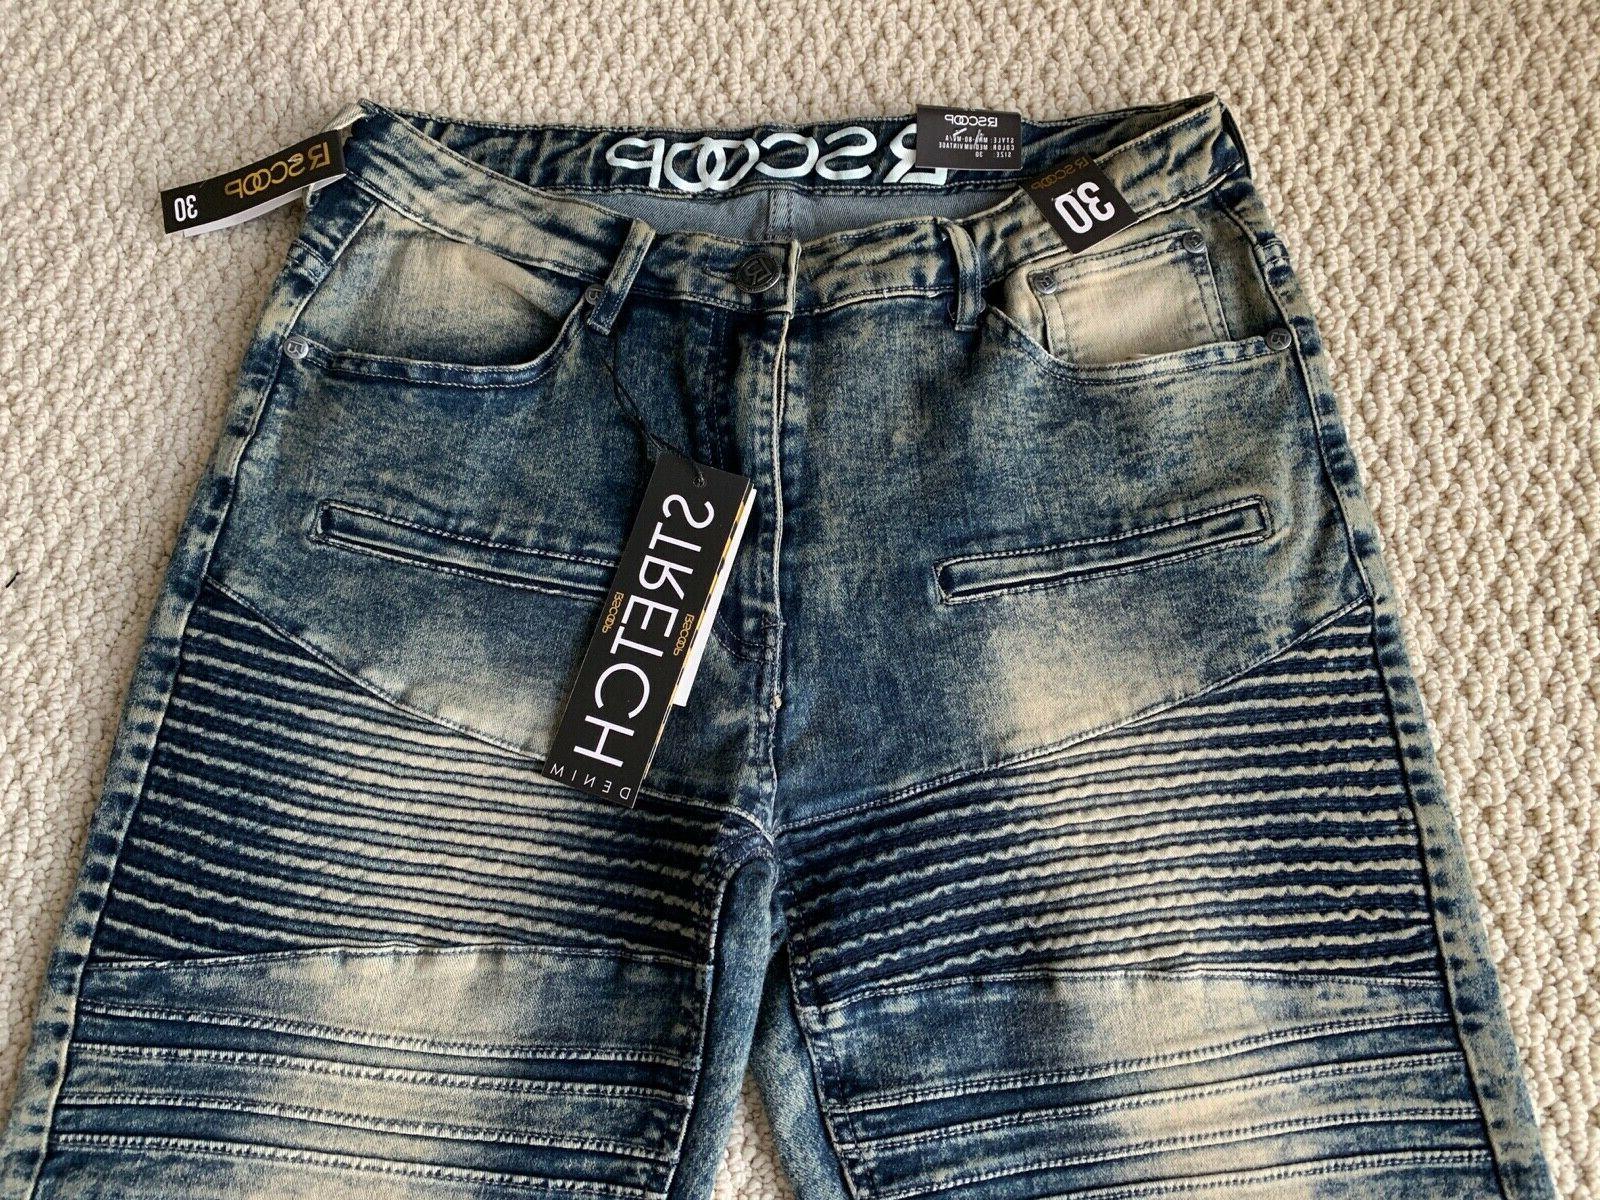 NWT Men's LR MHS80 Vintage Blue Moto Acid Shorts